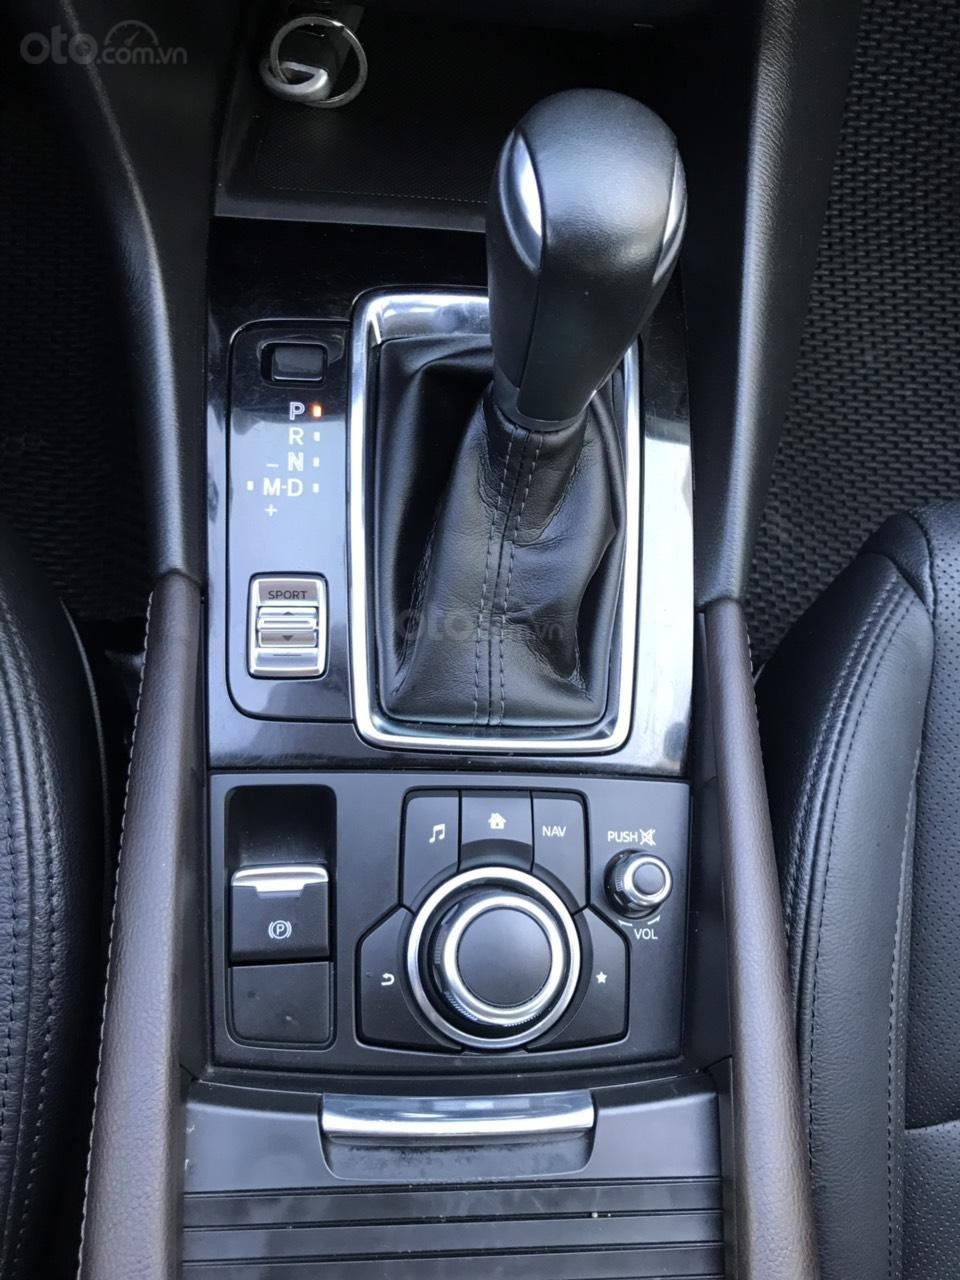 ManyCar bán Mazda 3 sedan model 2018, xe đẹp đi ít (14)